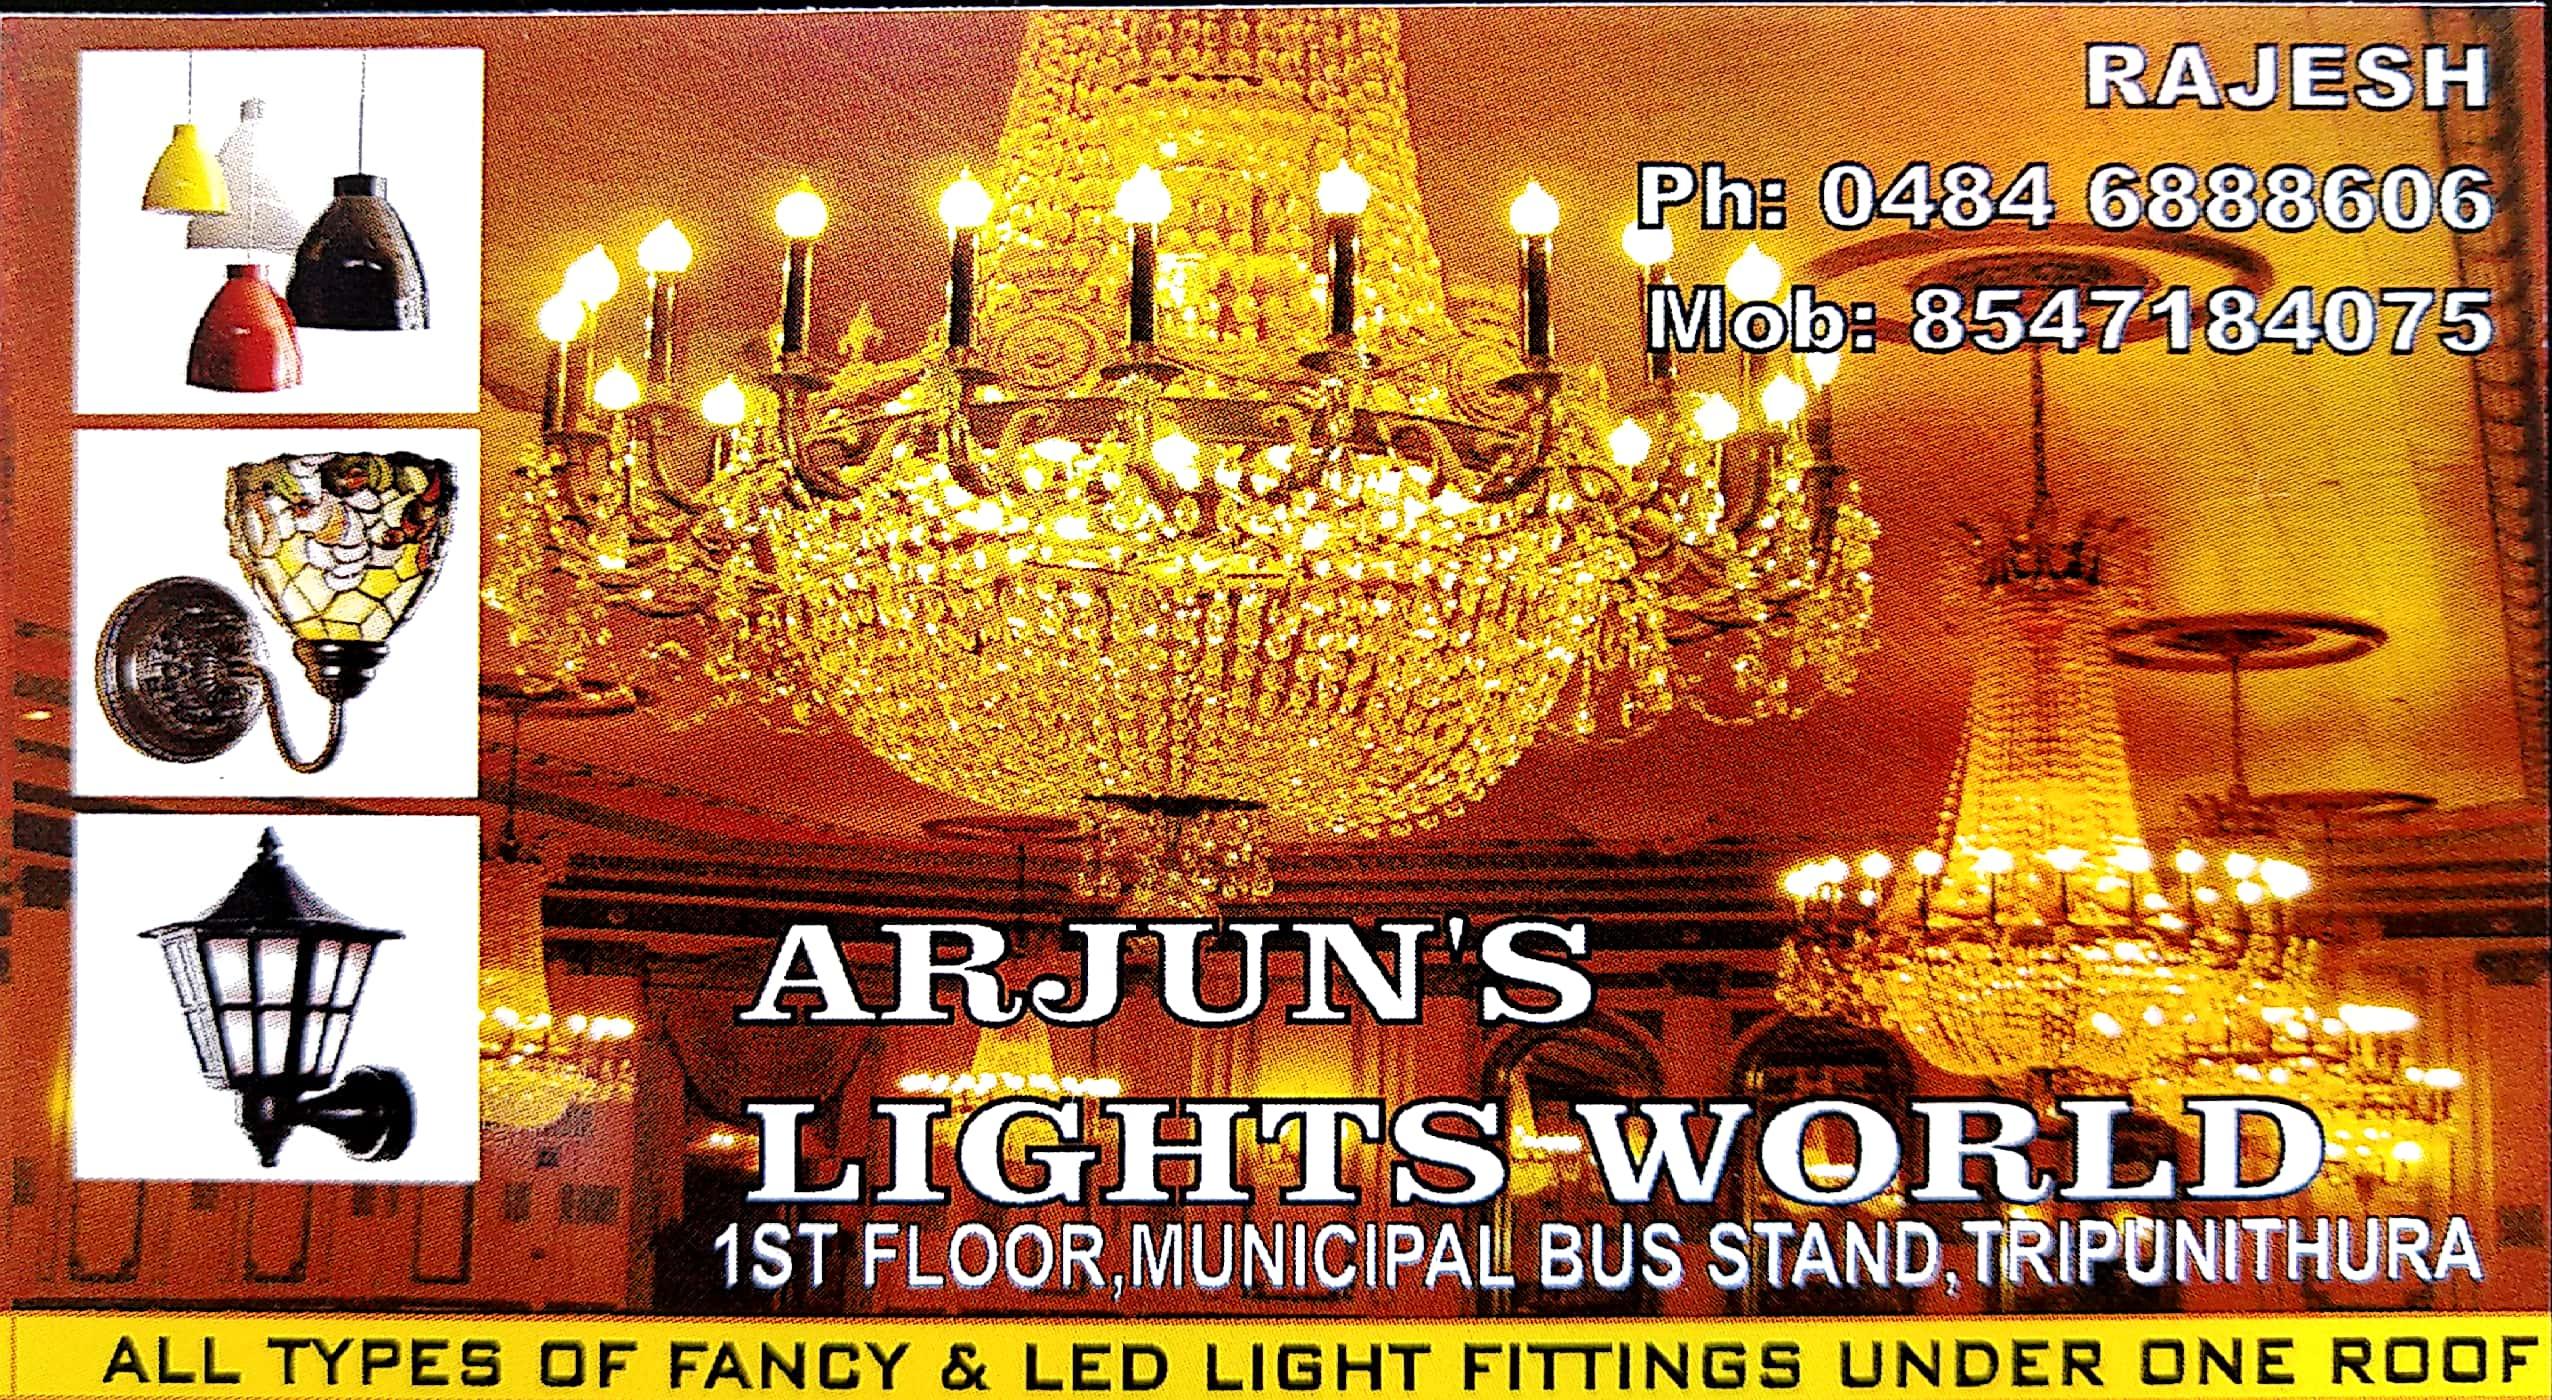 ARJUNS LIGHTS WORLD, LIGHT,  service in Thrippunithura, Ernakulam